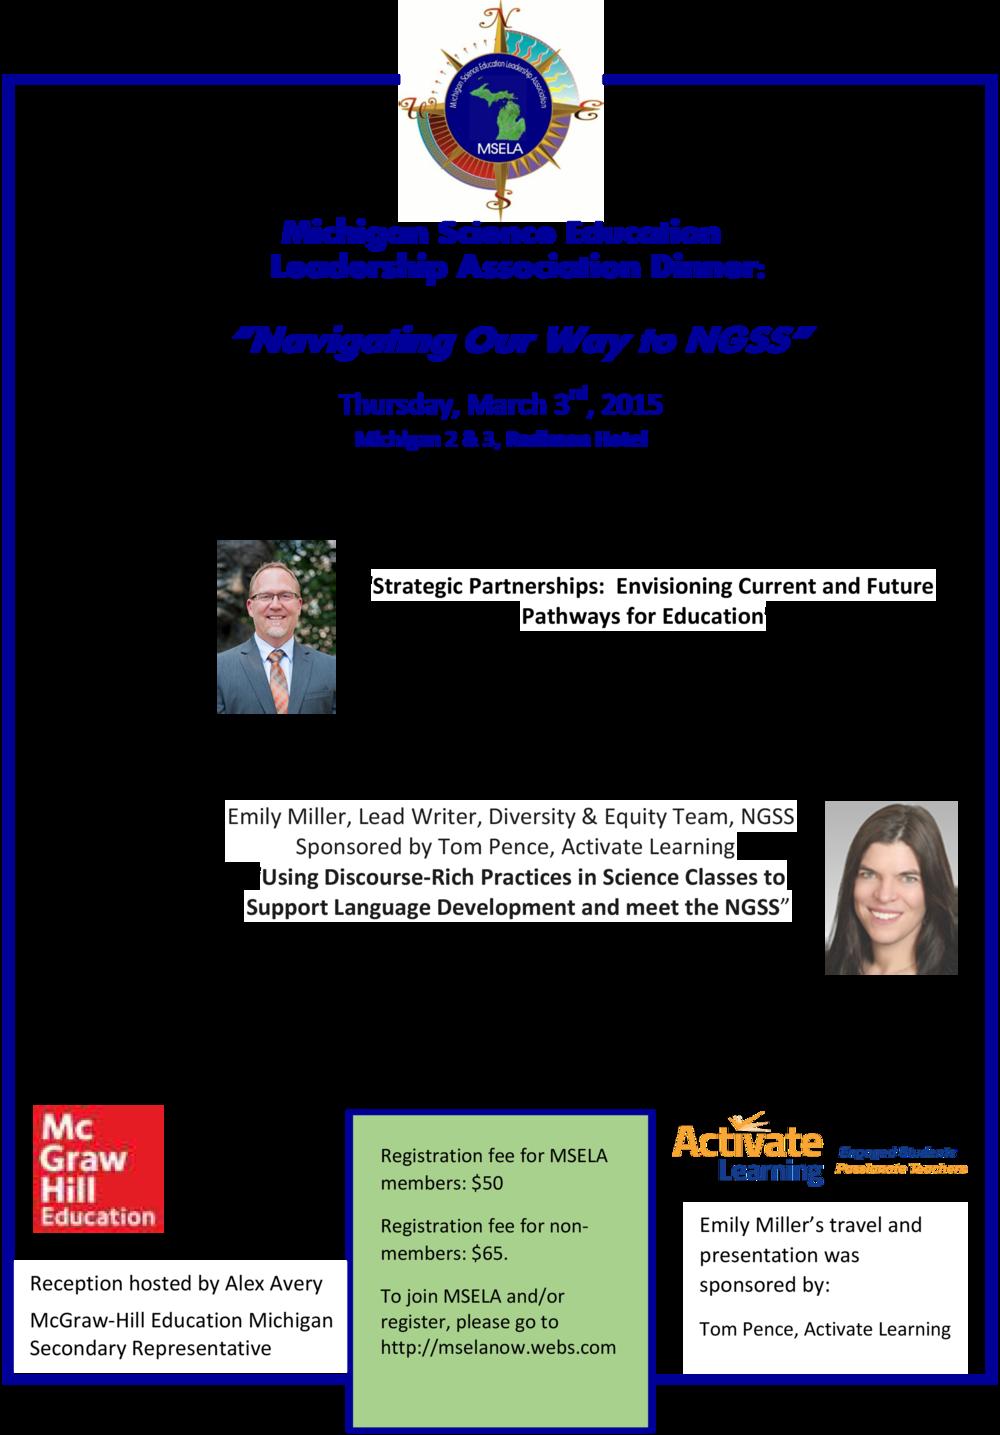 Activate Learning sponsors Emily Miller MSELA